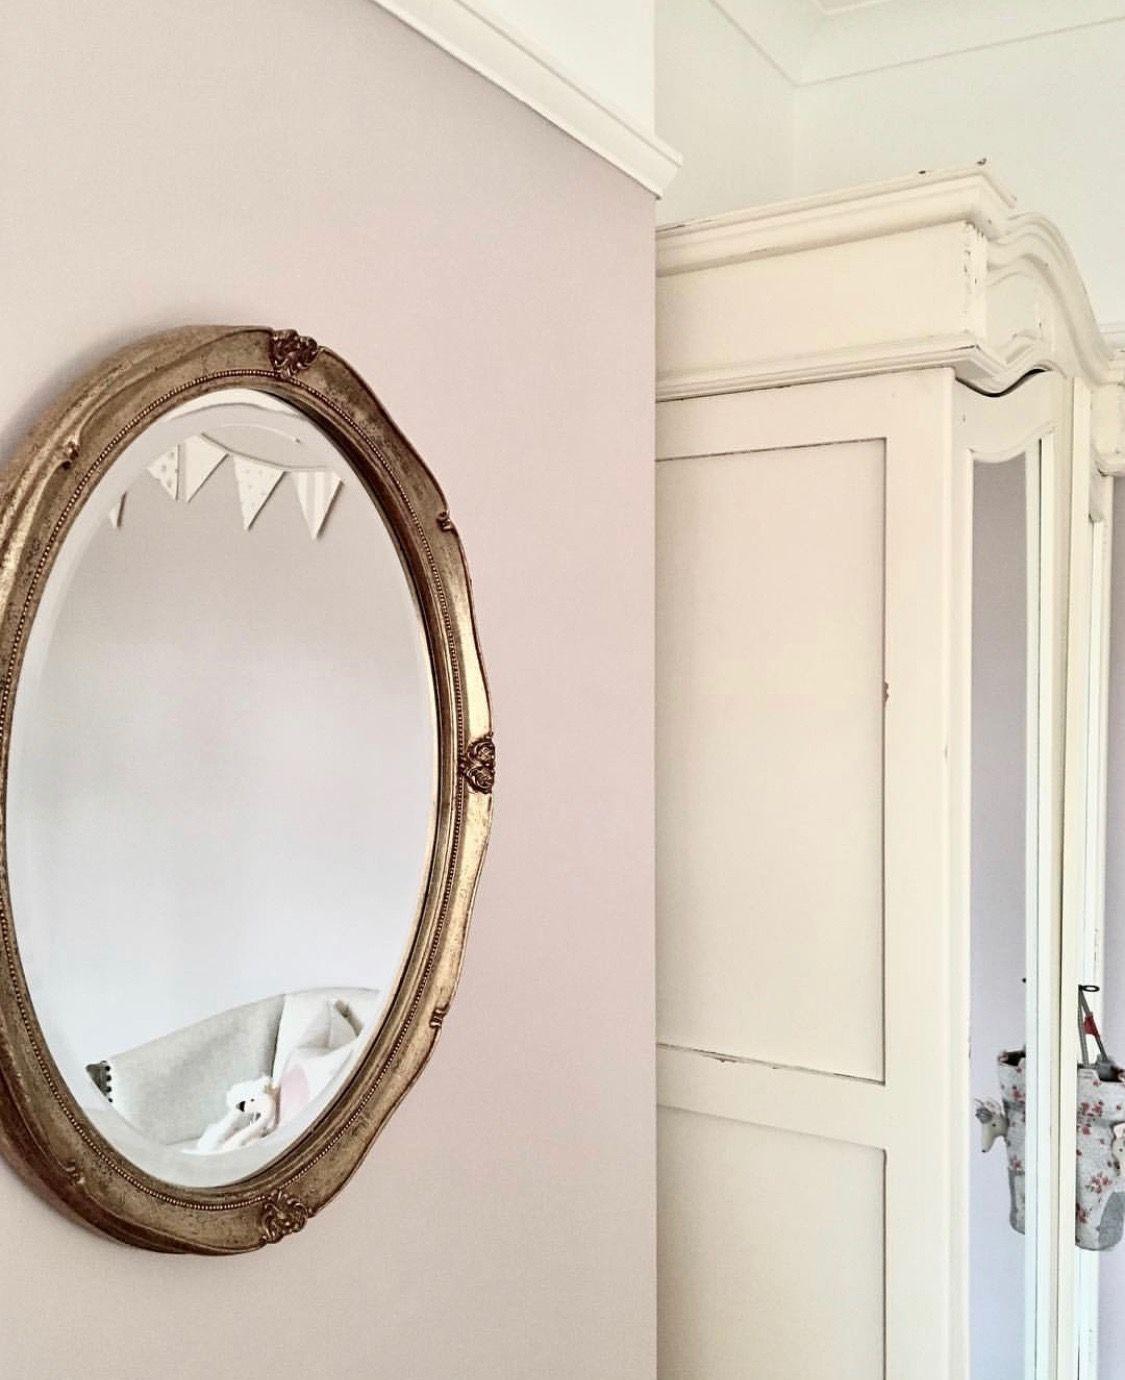 Dulux paint in satin bow dulux dulux paint craft room